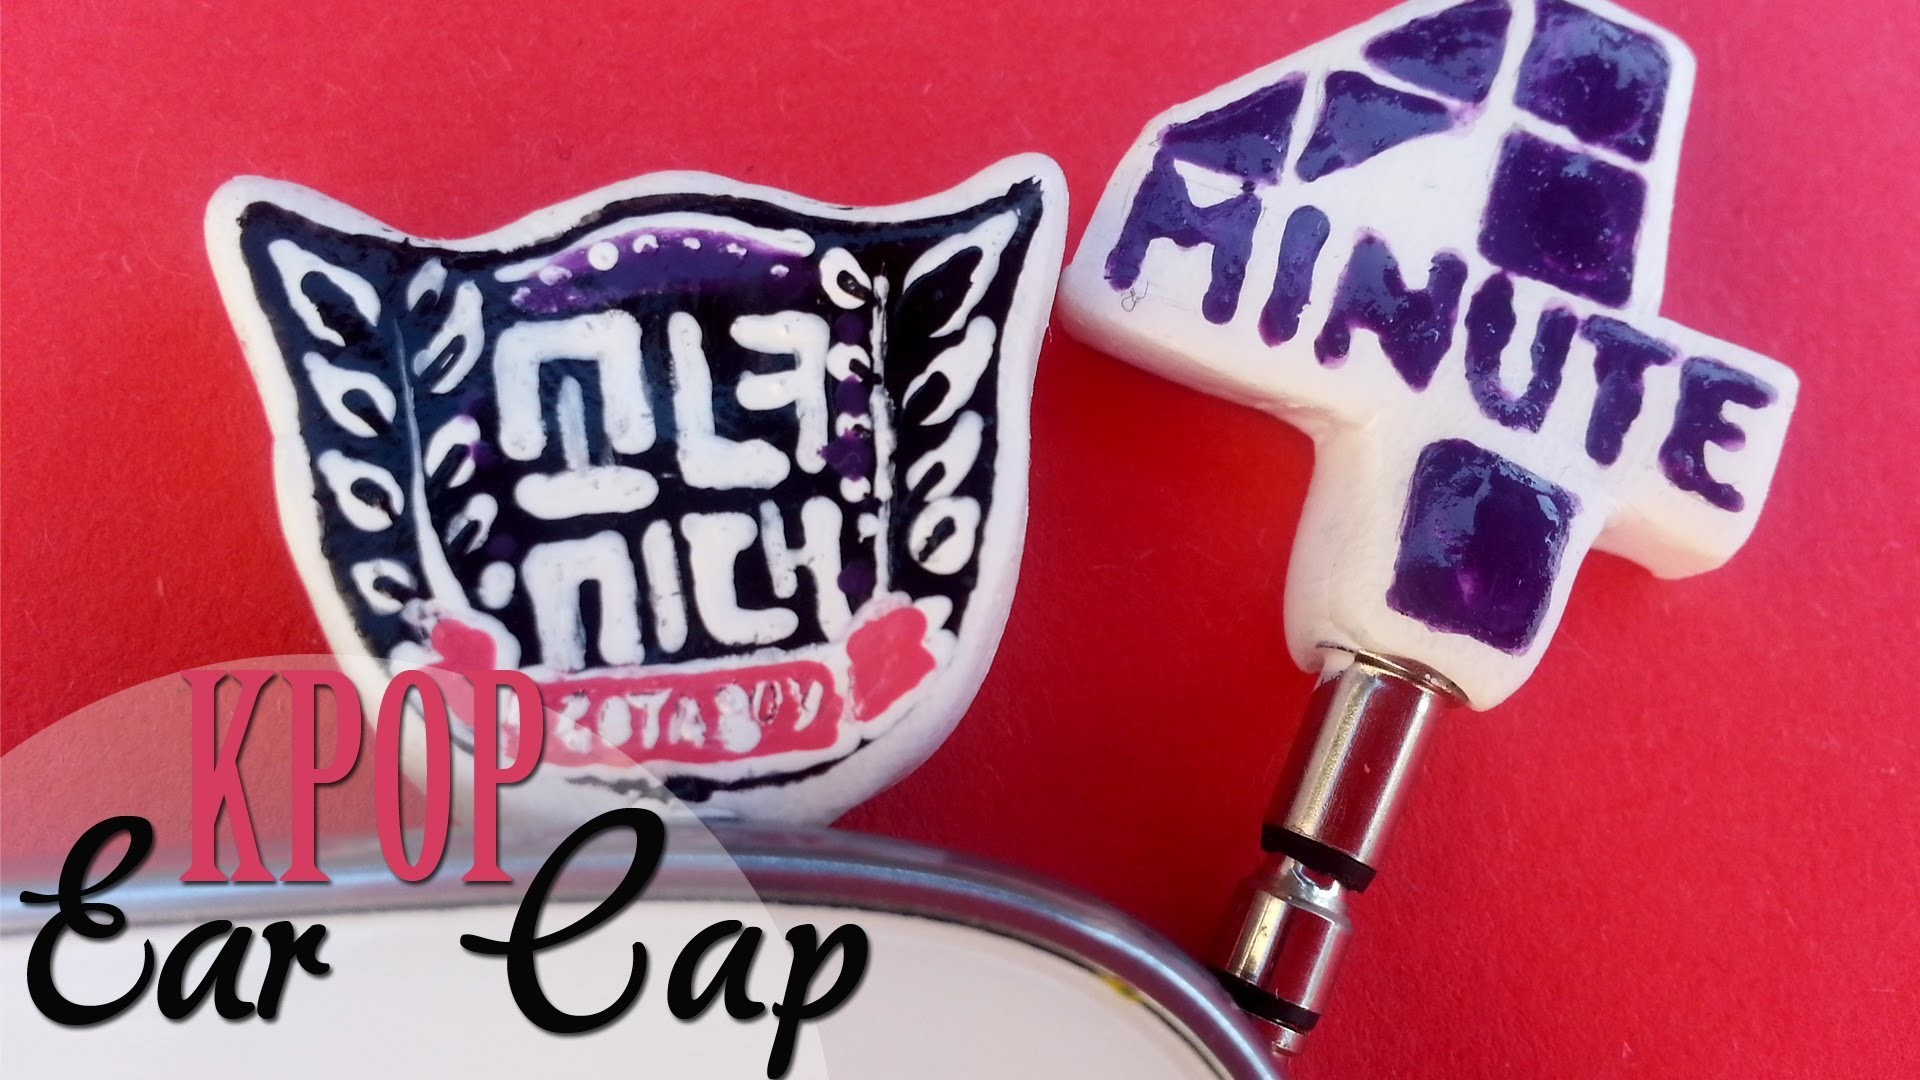 DIY: Tapa antipolvo Kpop. Kpop Ear Cap -SNSD & 4MINUTE-